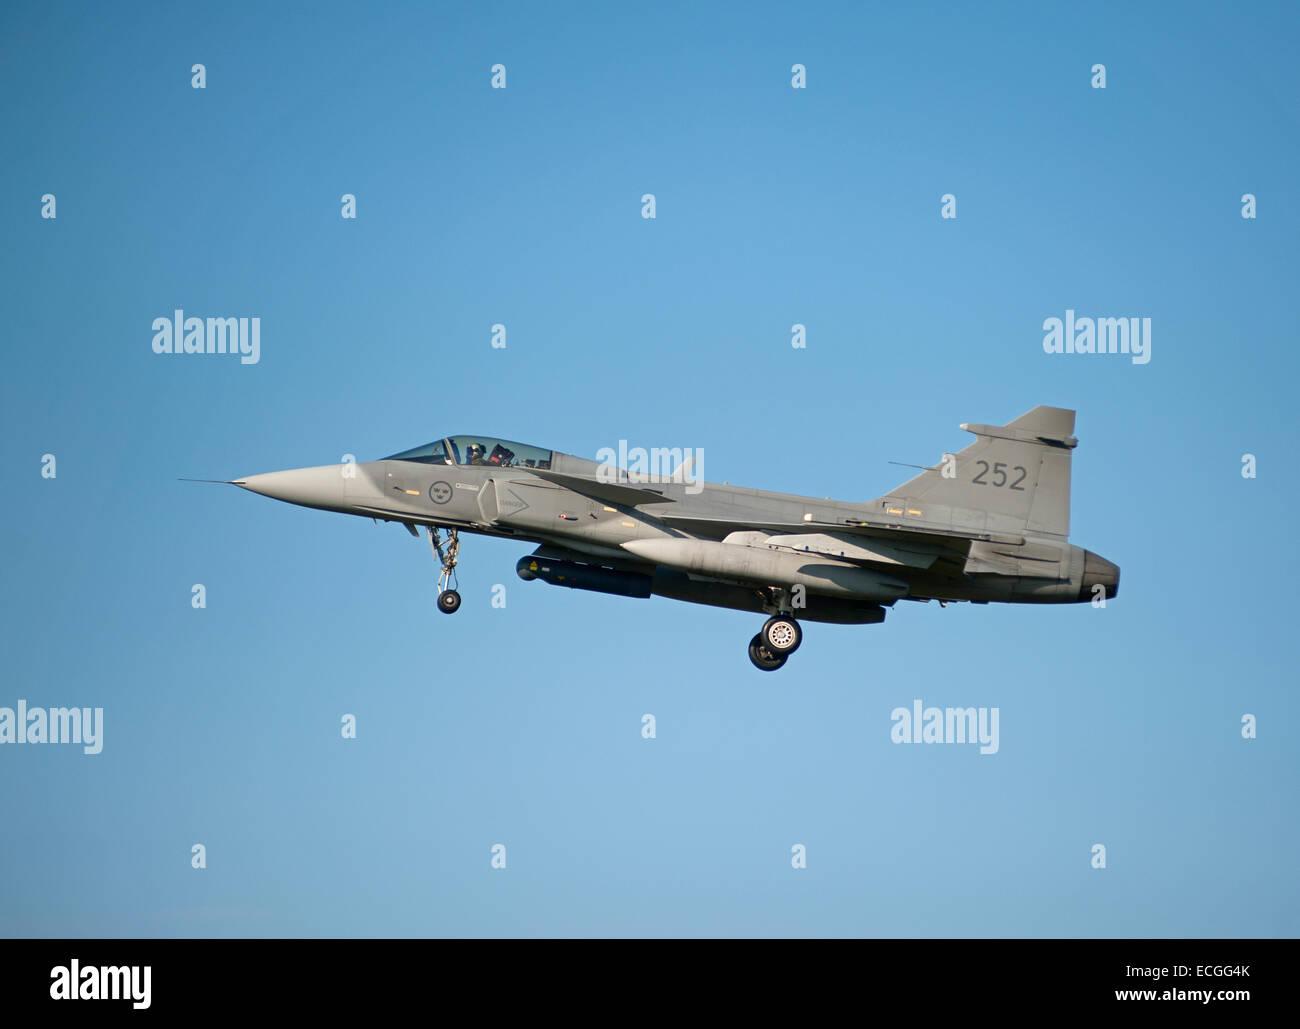 Swedish Saab Gripen No 252. Mach 2 Fighter Jet, approaching RAF Lossiemouth Scotland.  SCO 9316. - Stock Image